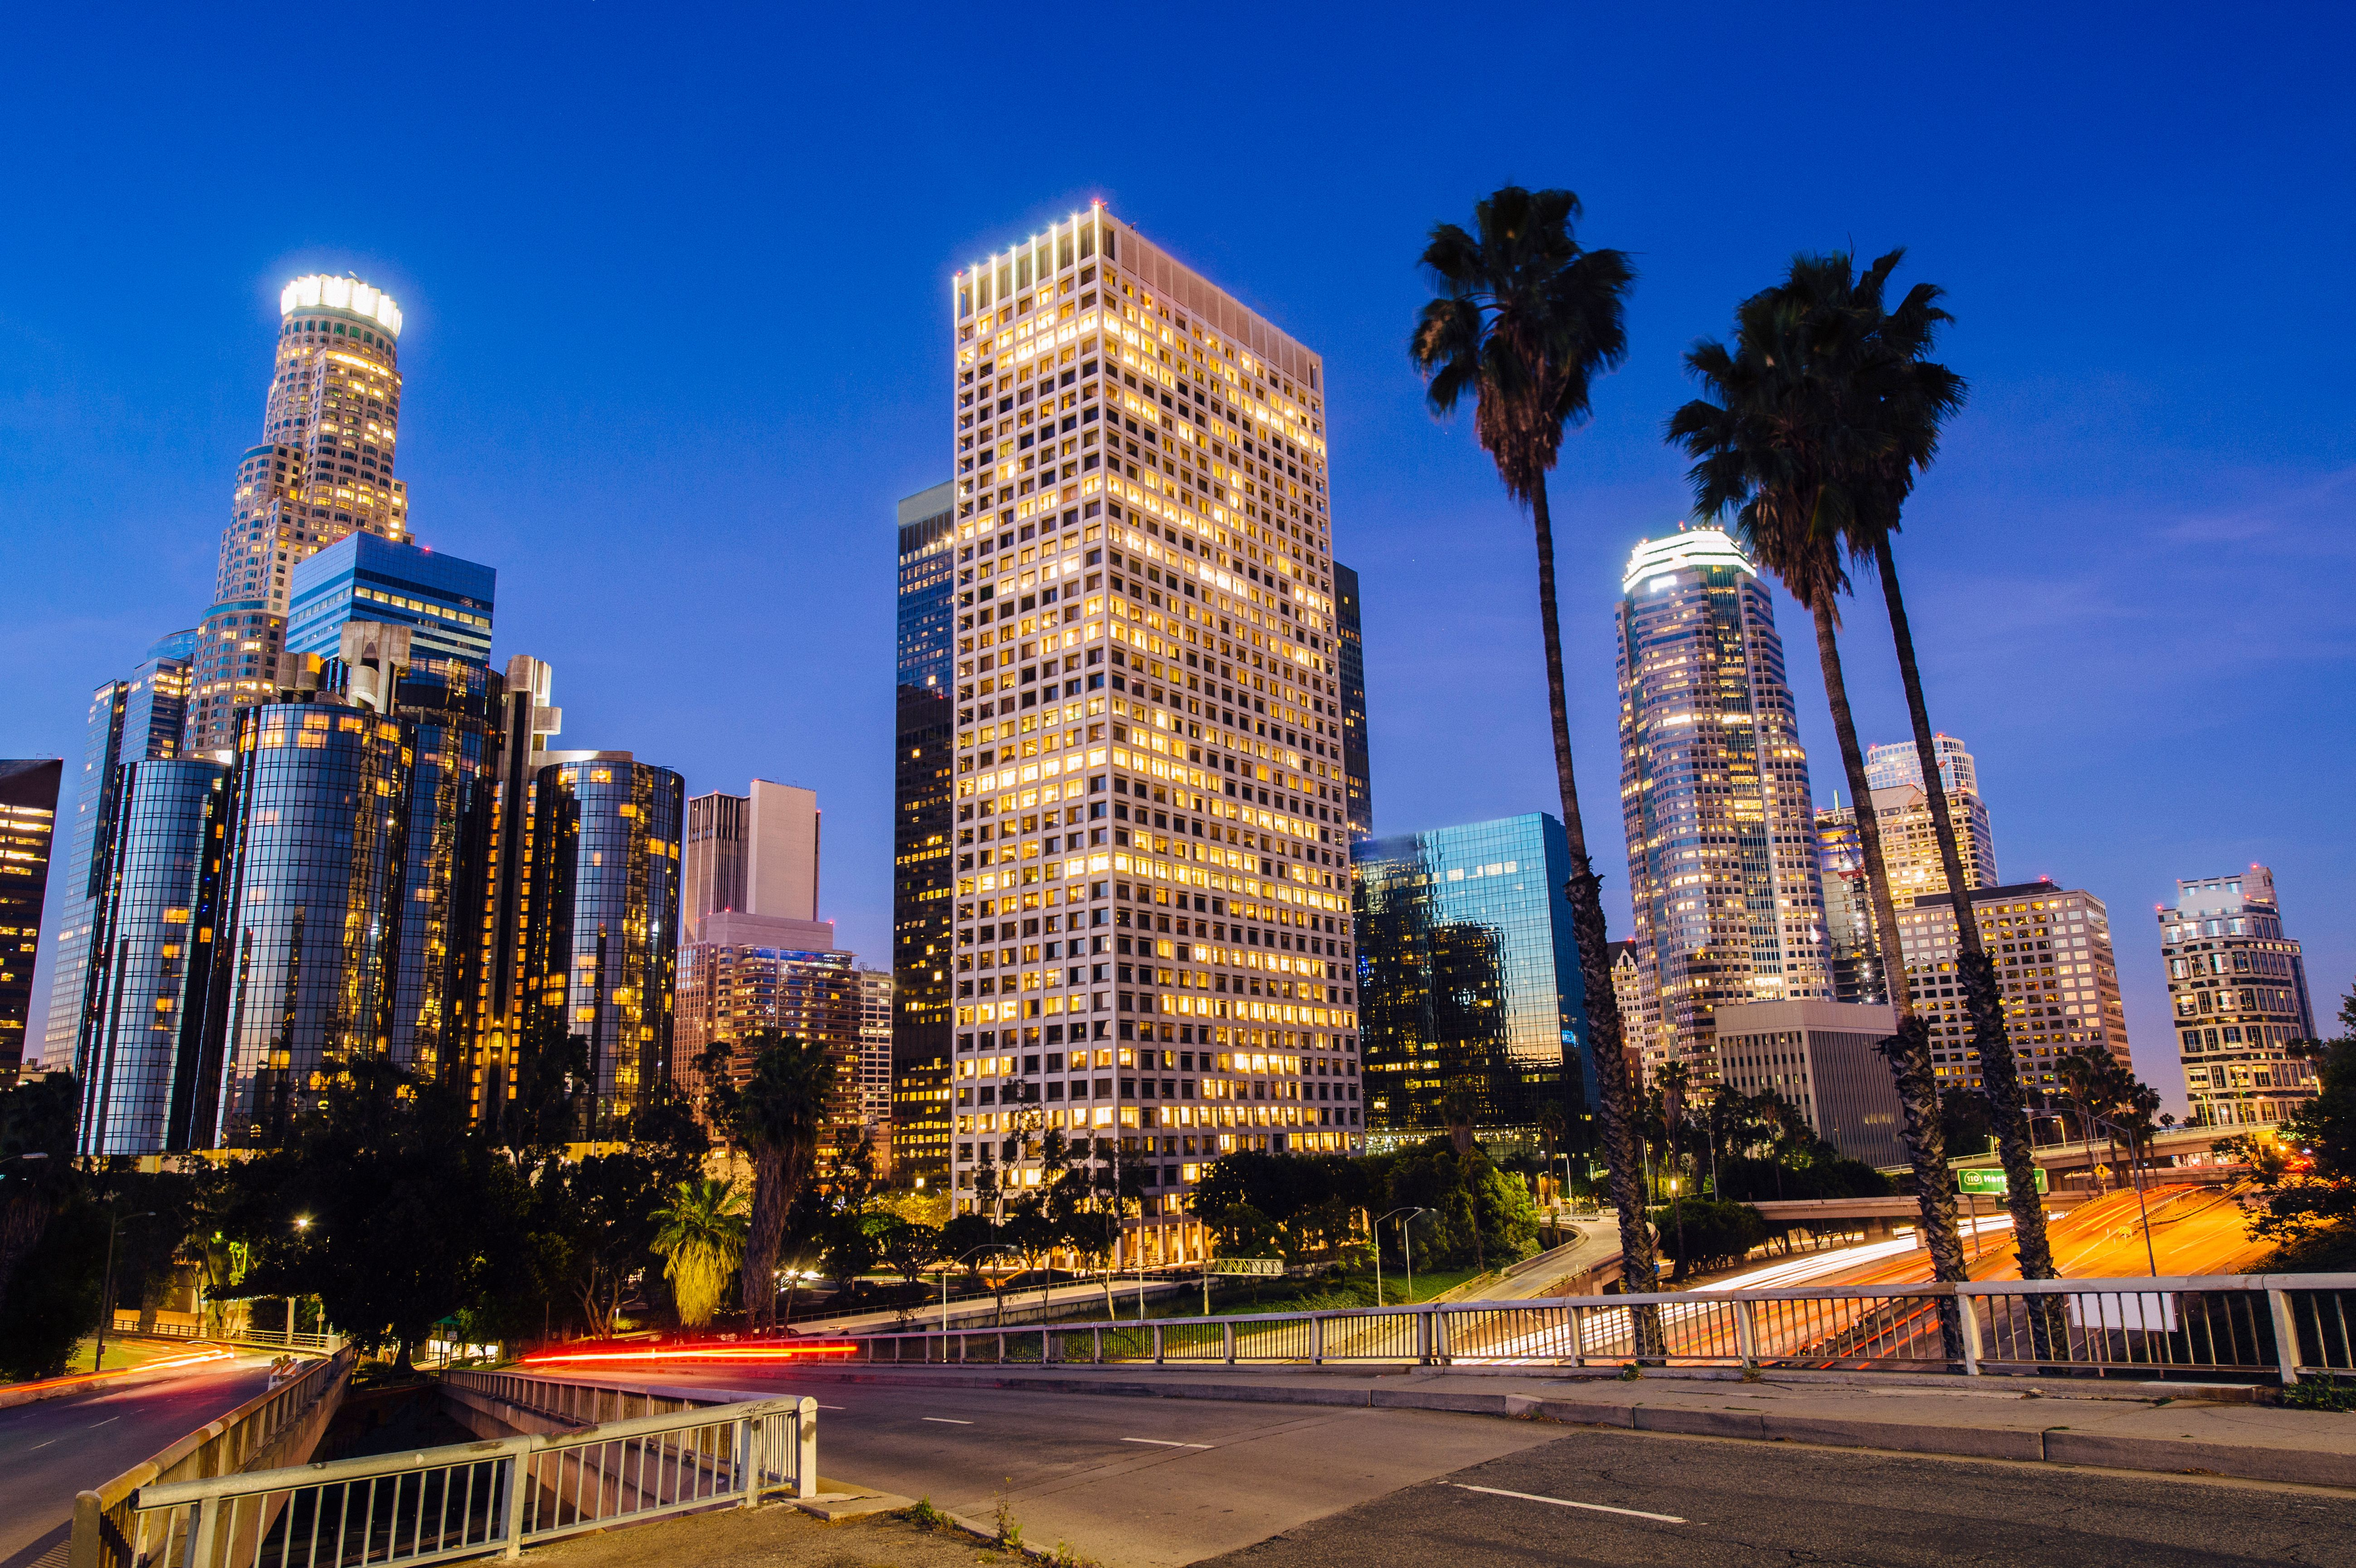 los angeles california skyline photo gallery